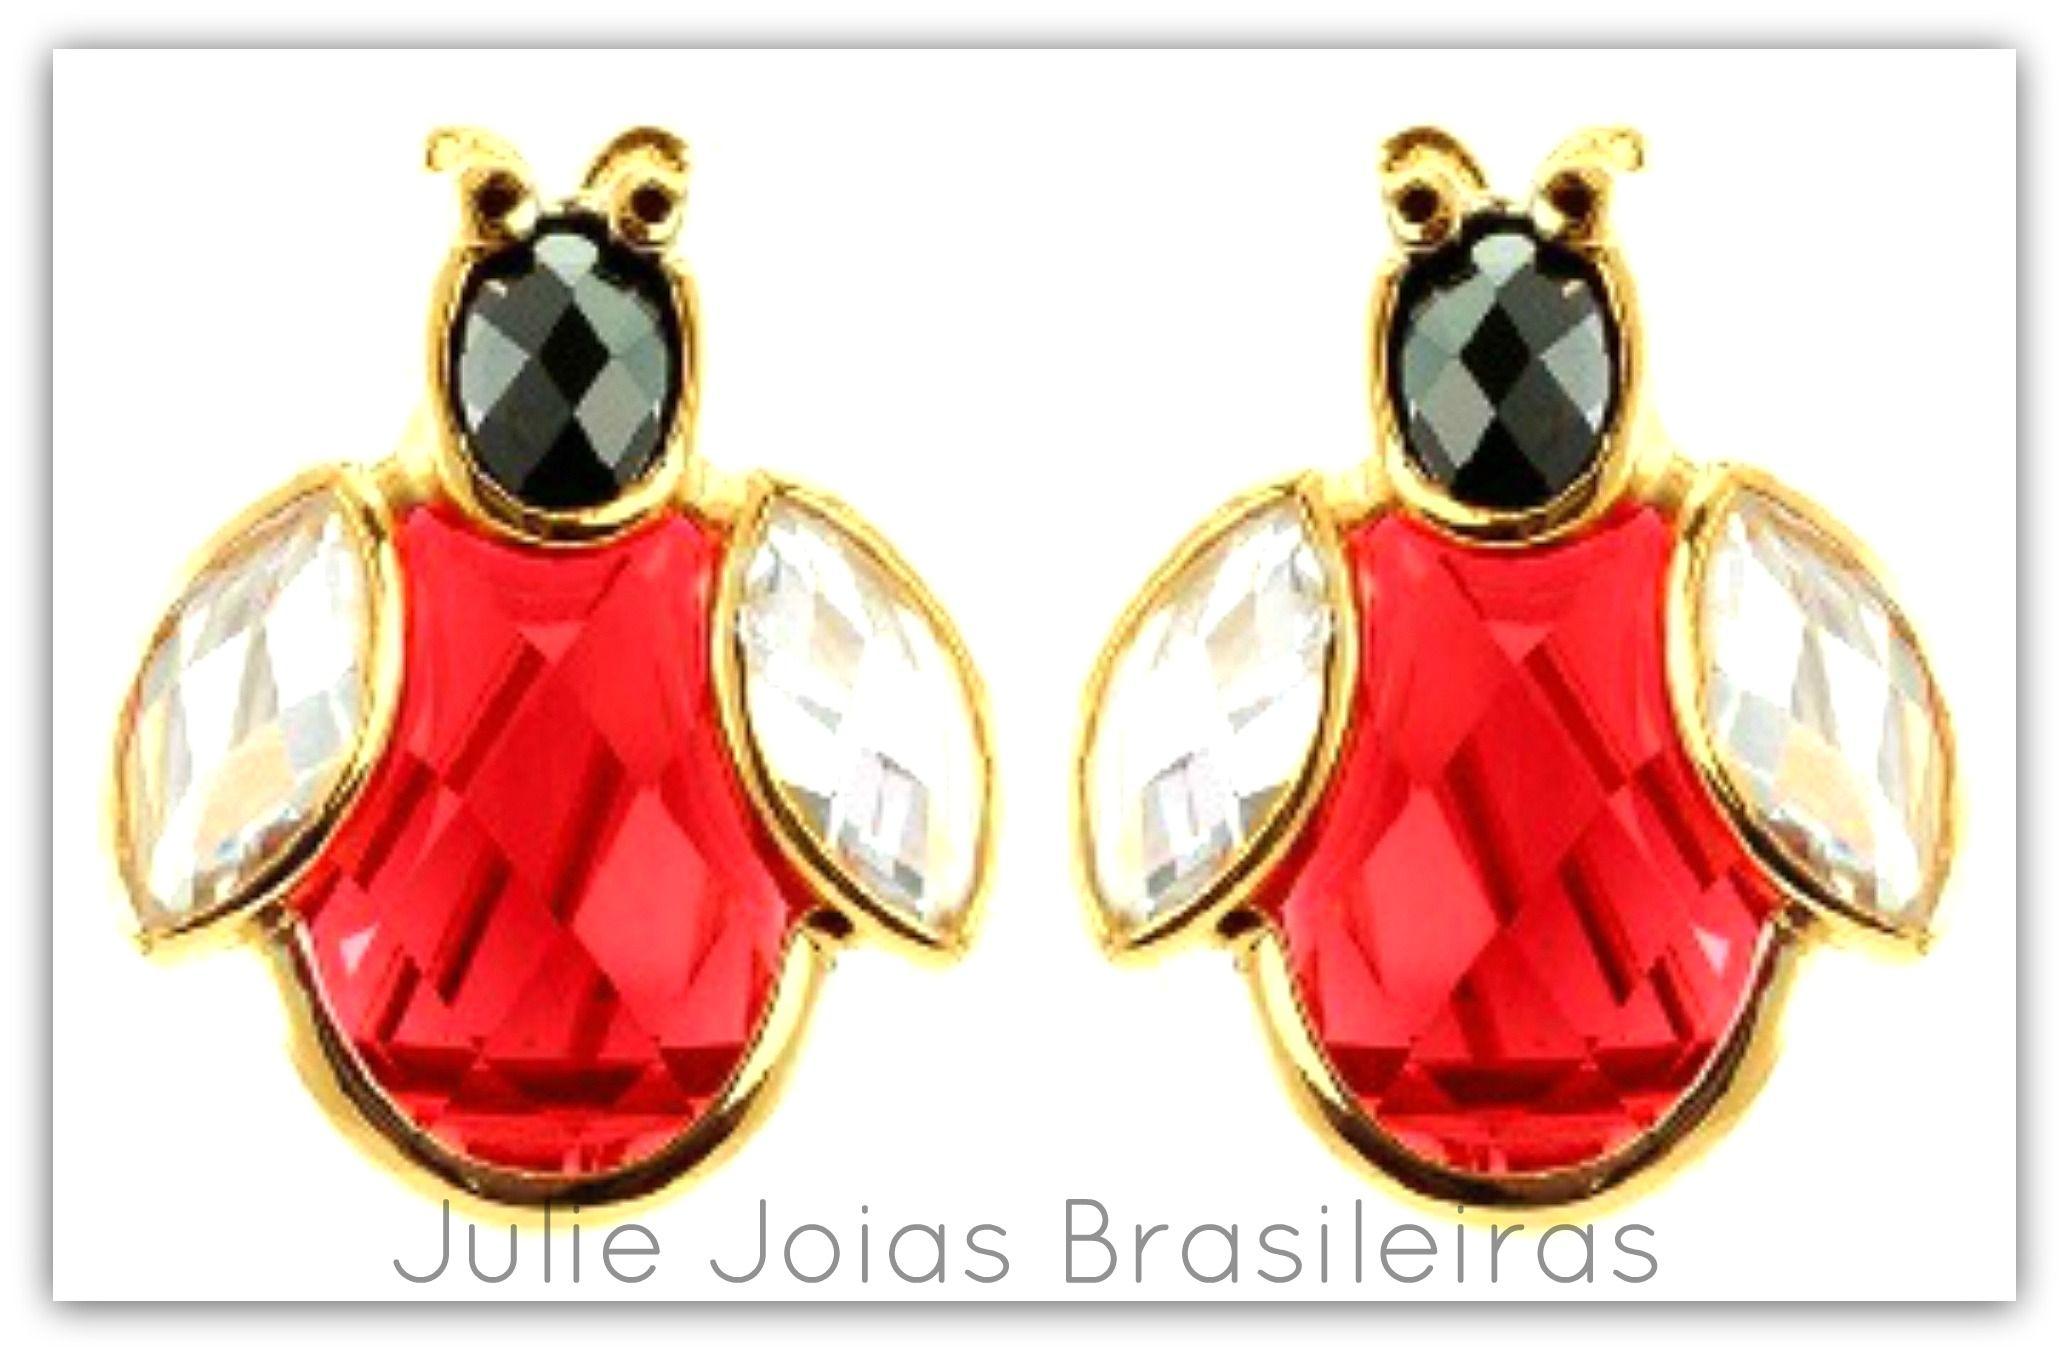 Brincos em ouro 750/18k, cristal-de-rocha, ônix e granada(750/18k gold earrings with rock crystal, onyx and grenate)